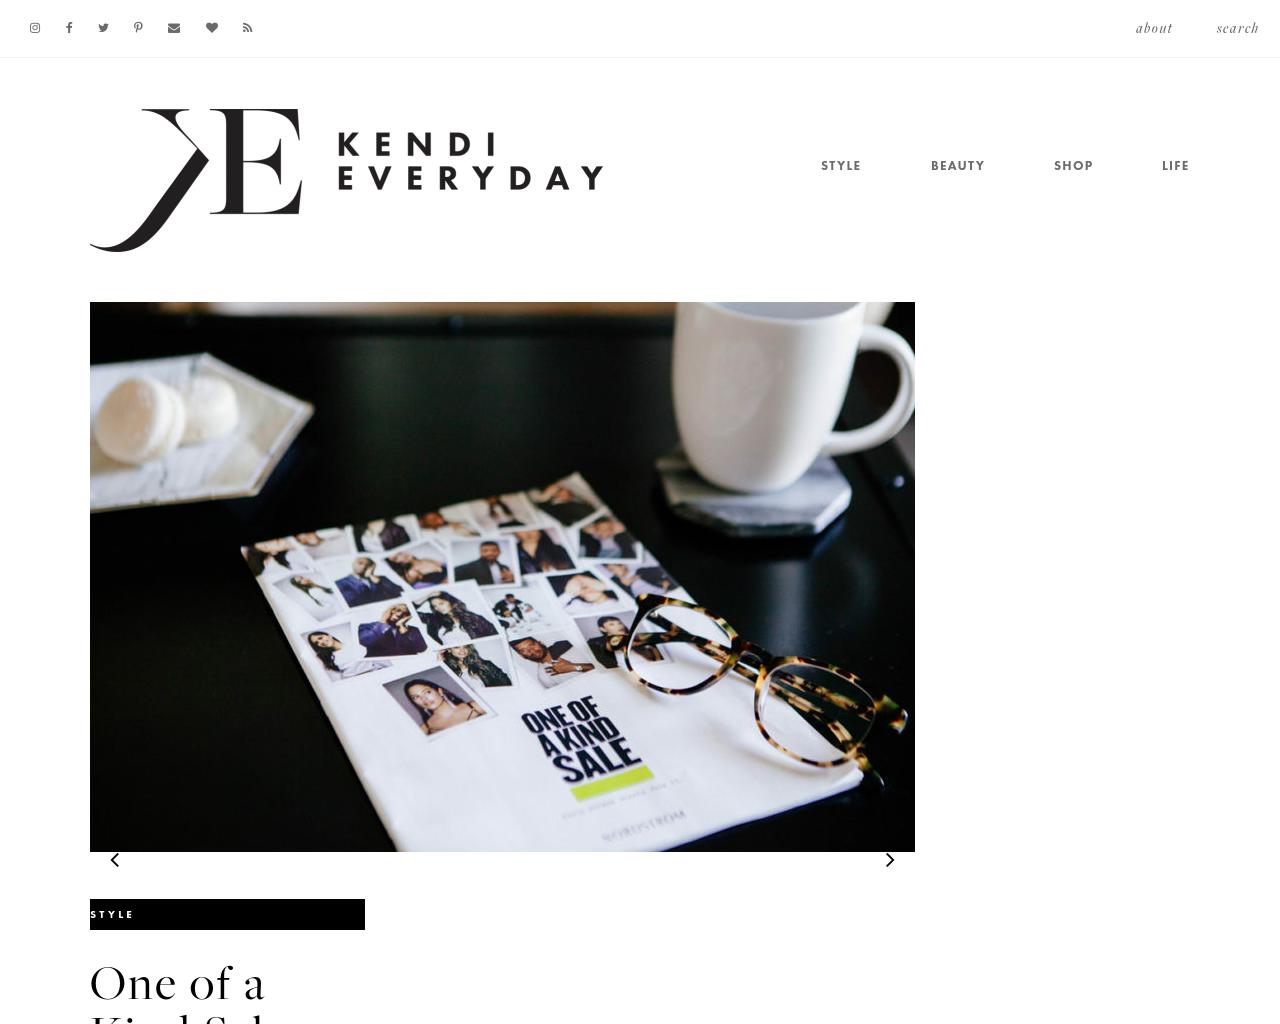 Kendi-Everyday-Advertising-Reviews-Pricing